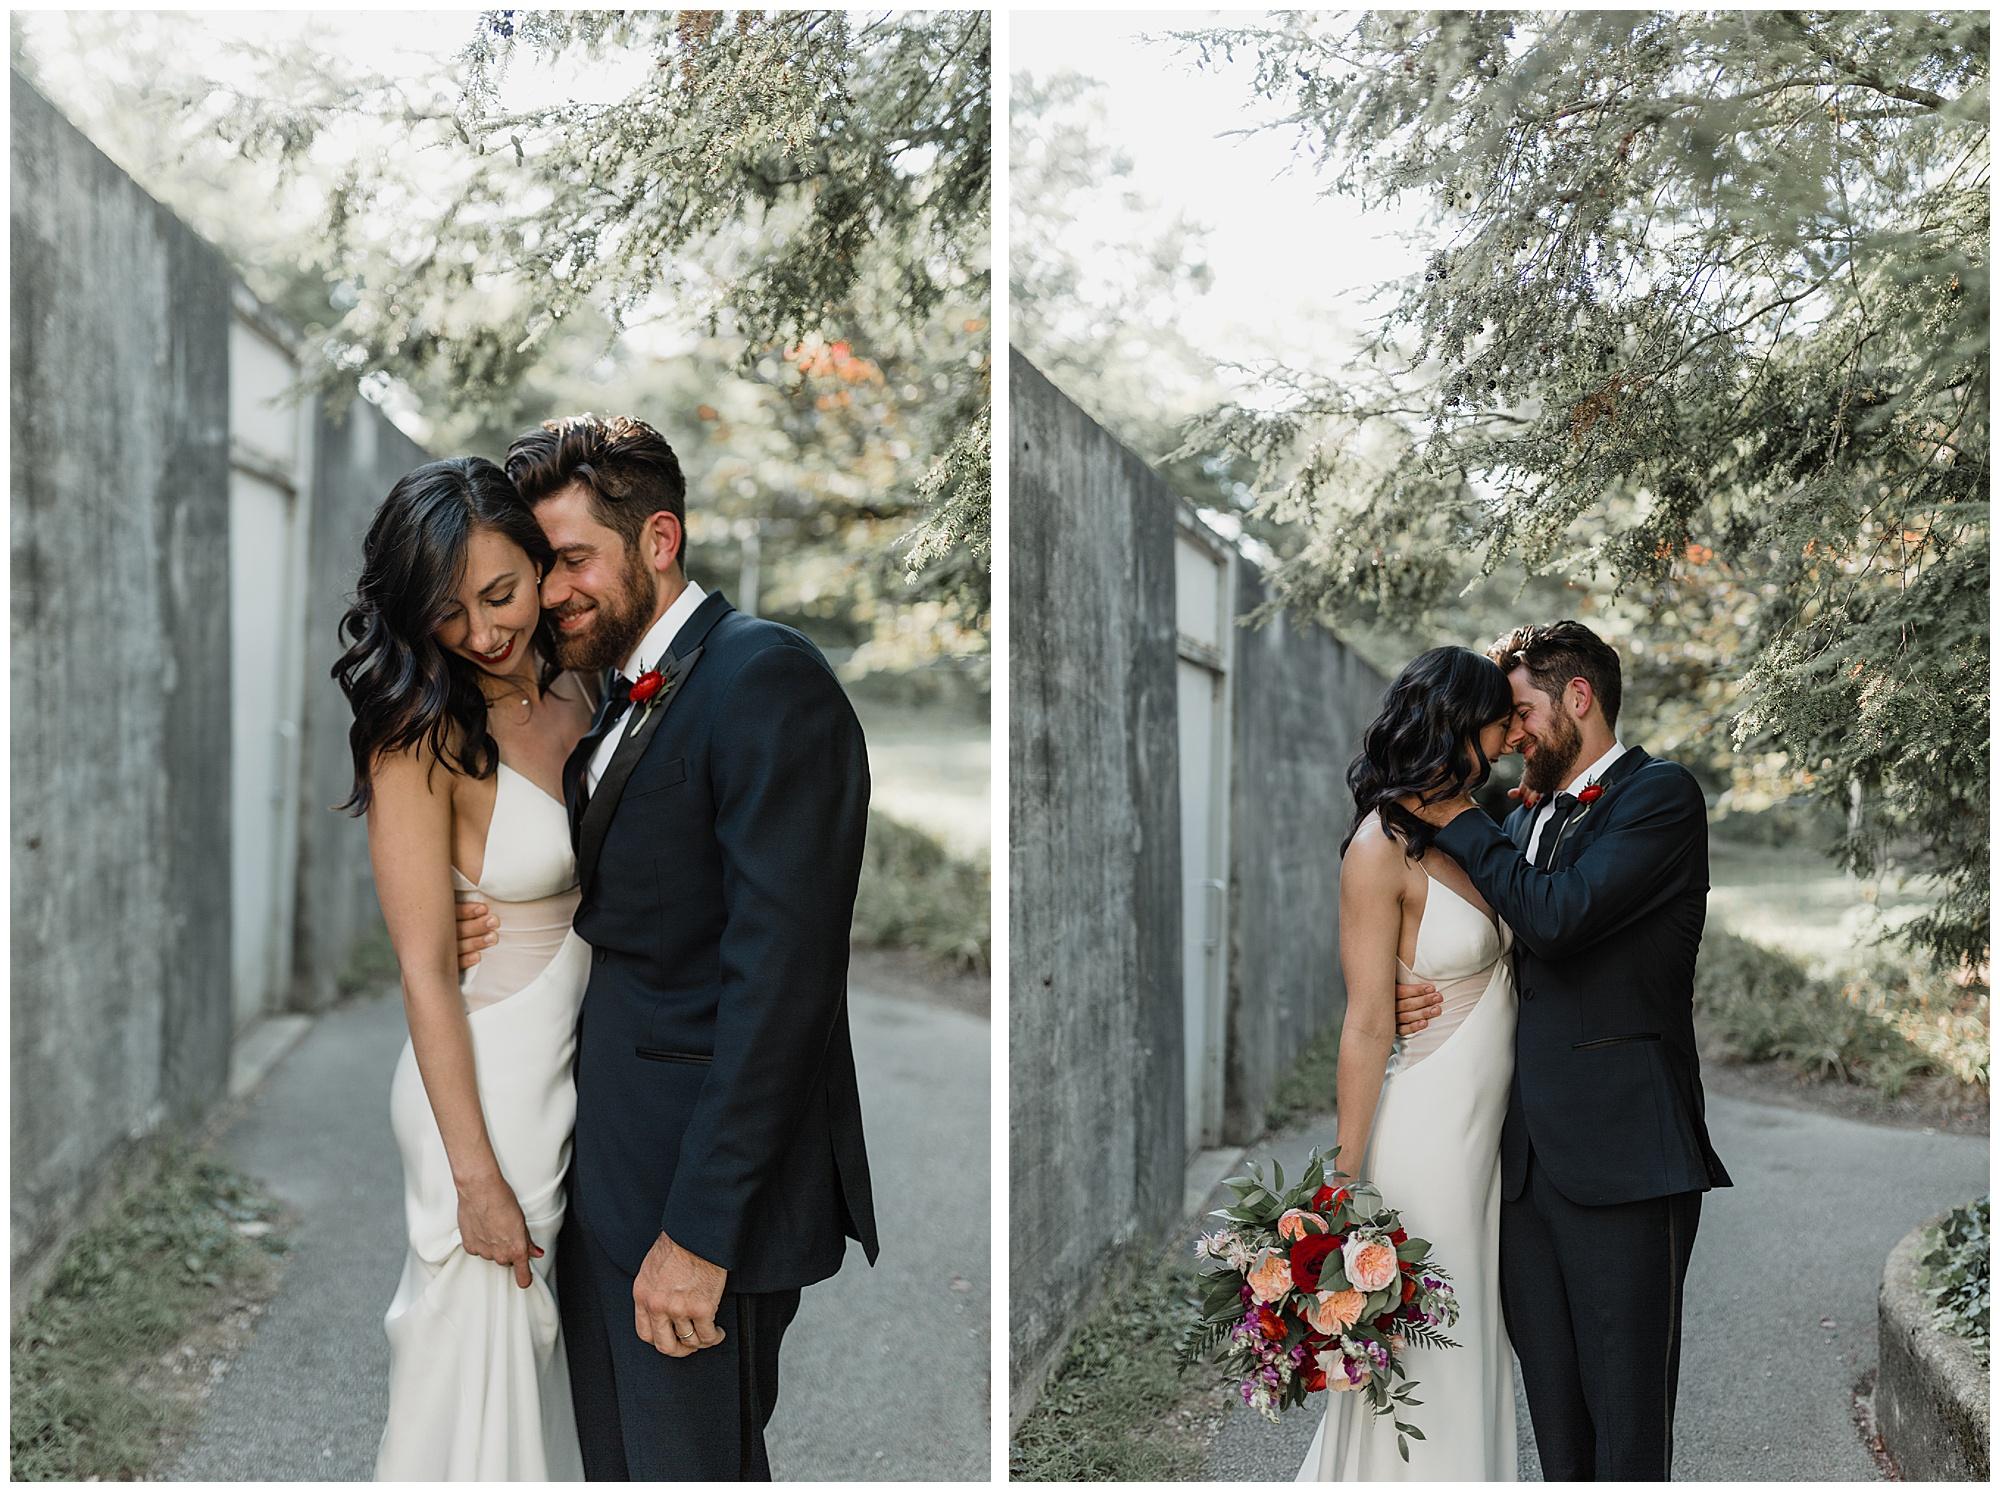 allerton_park_wedding_champaign_il_chicago_wright_photographs_ne_0035.jpg